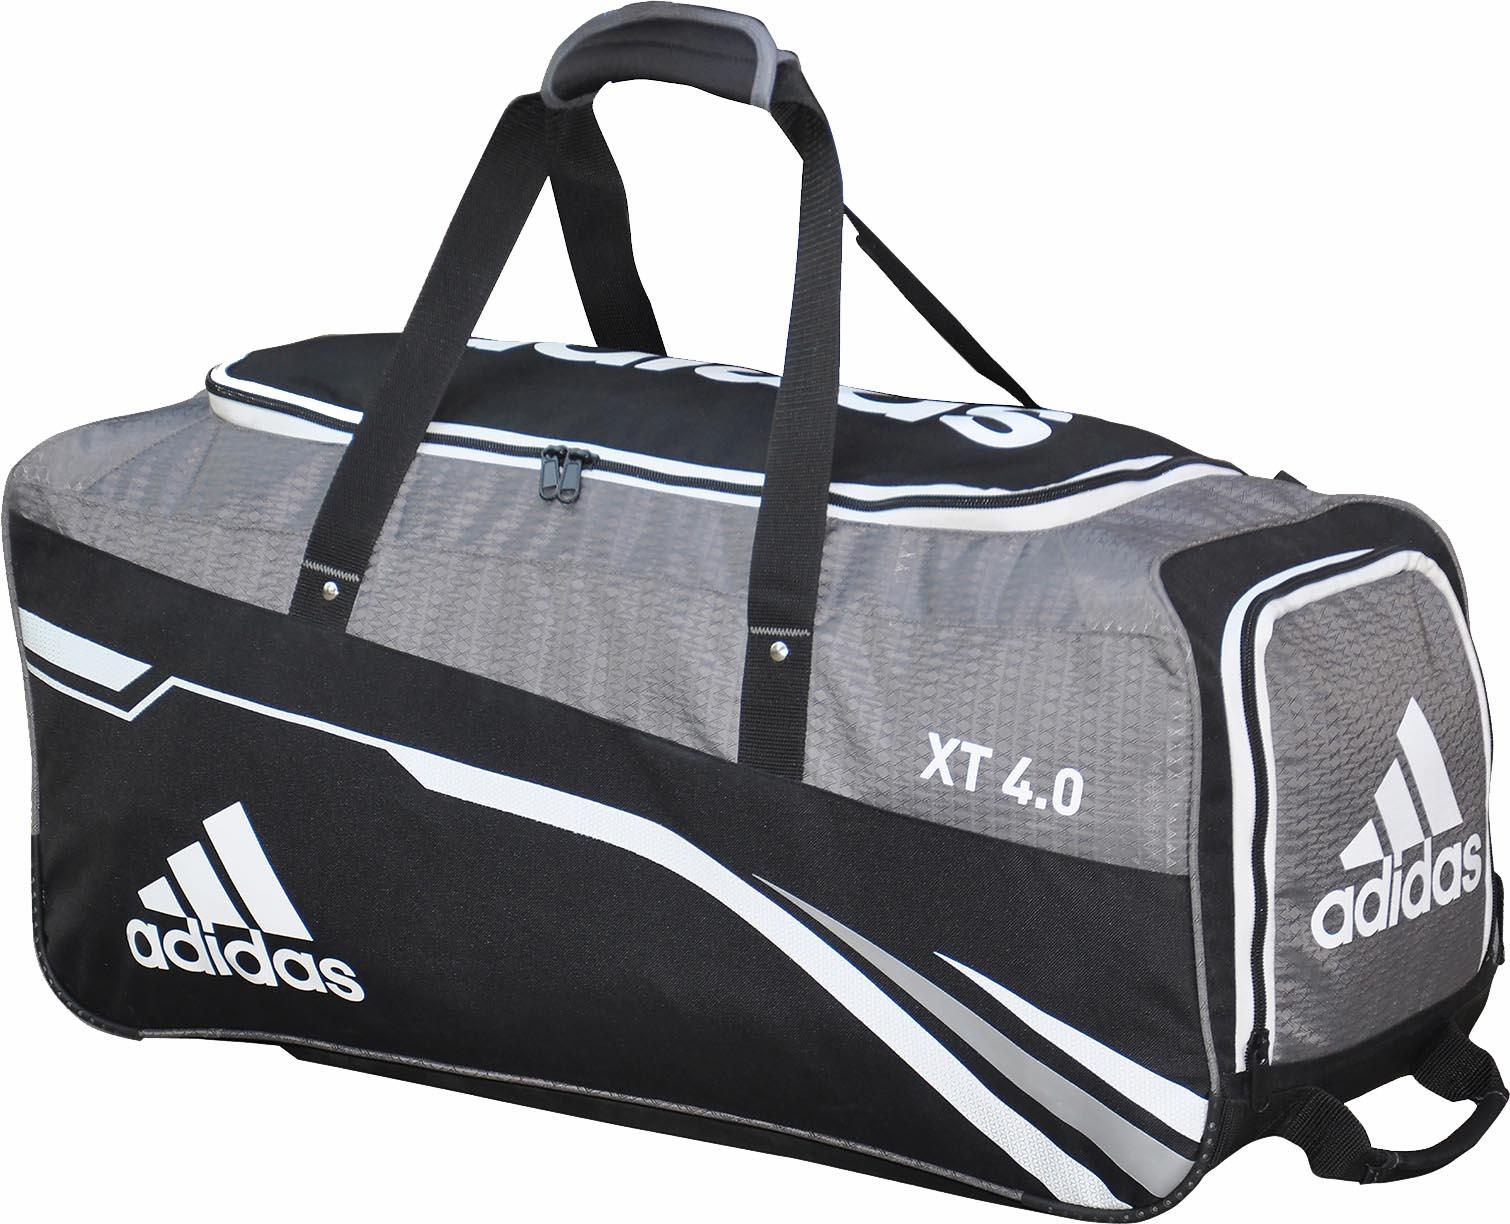 Hunts County Neo Cricket Bag Junior Wheelie Free Weekday Dispatch